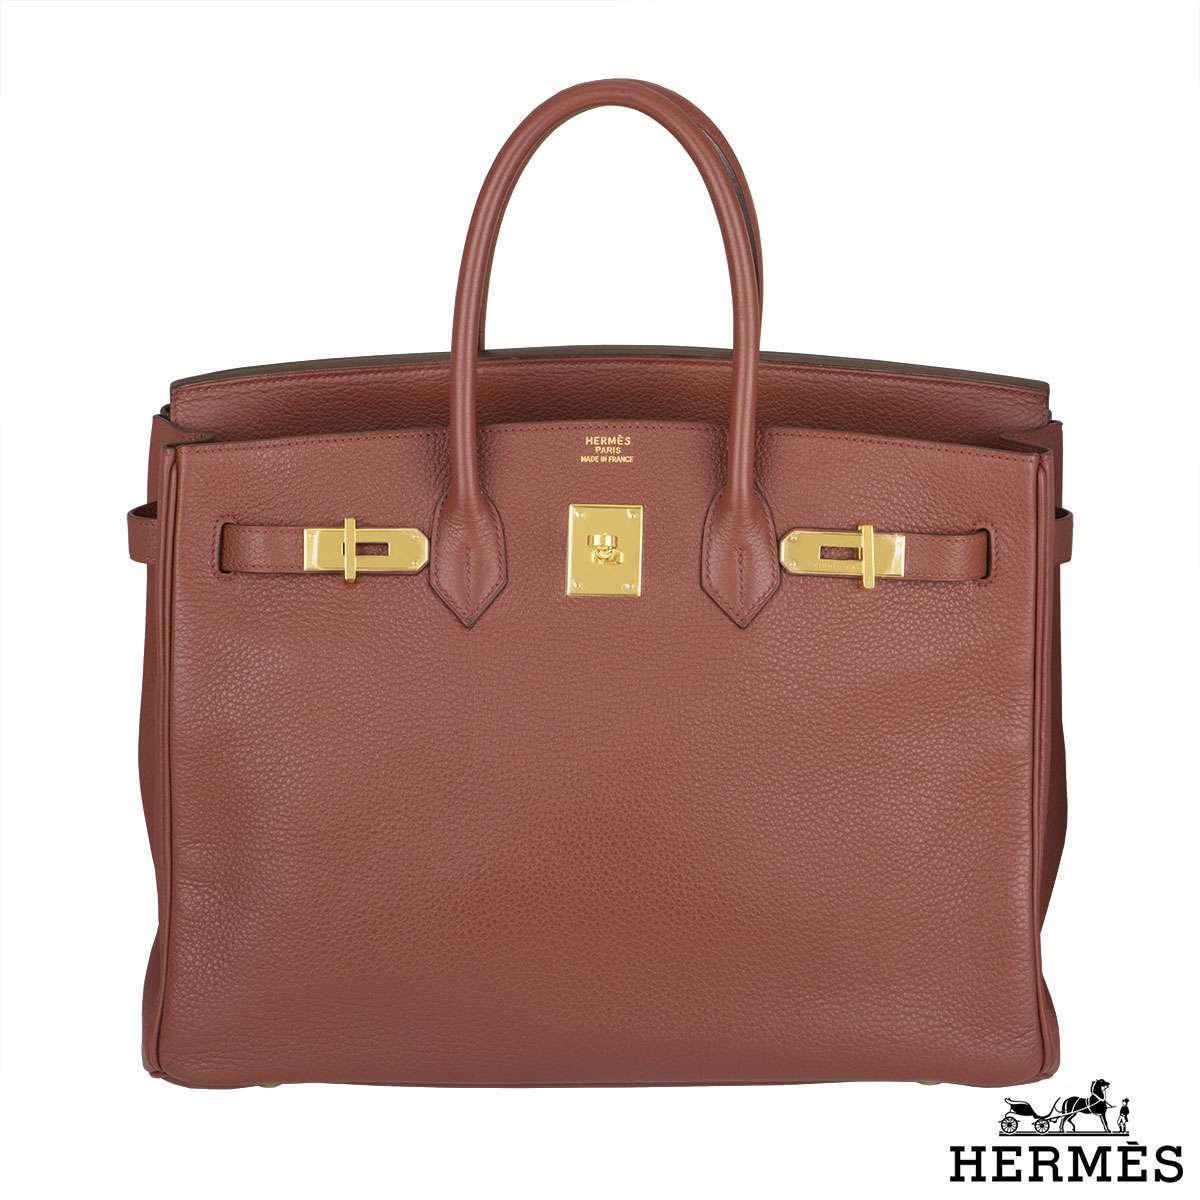 Hermes Birkin 35cm Sienne Handbag